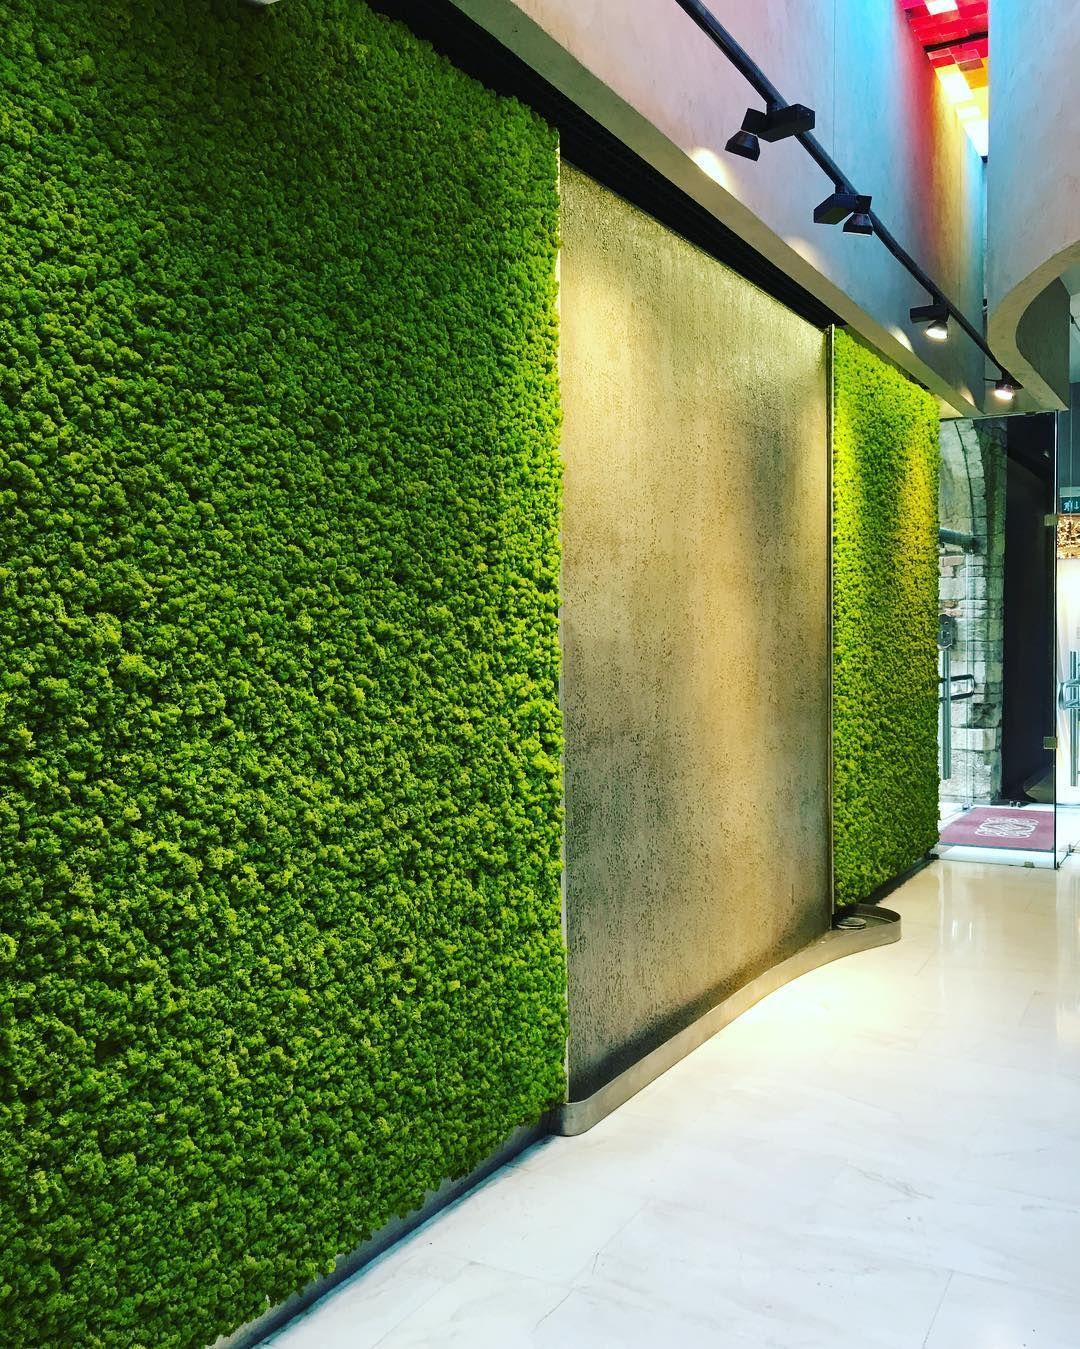 Swanky hotel lobby in Verona. Water feature & moss walls